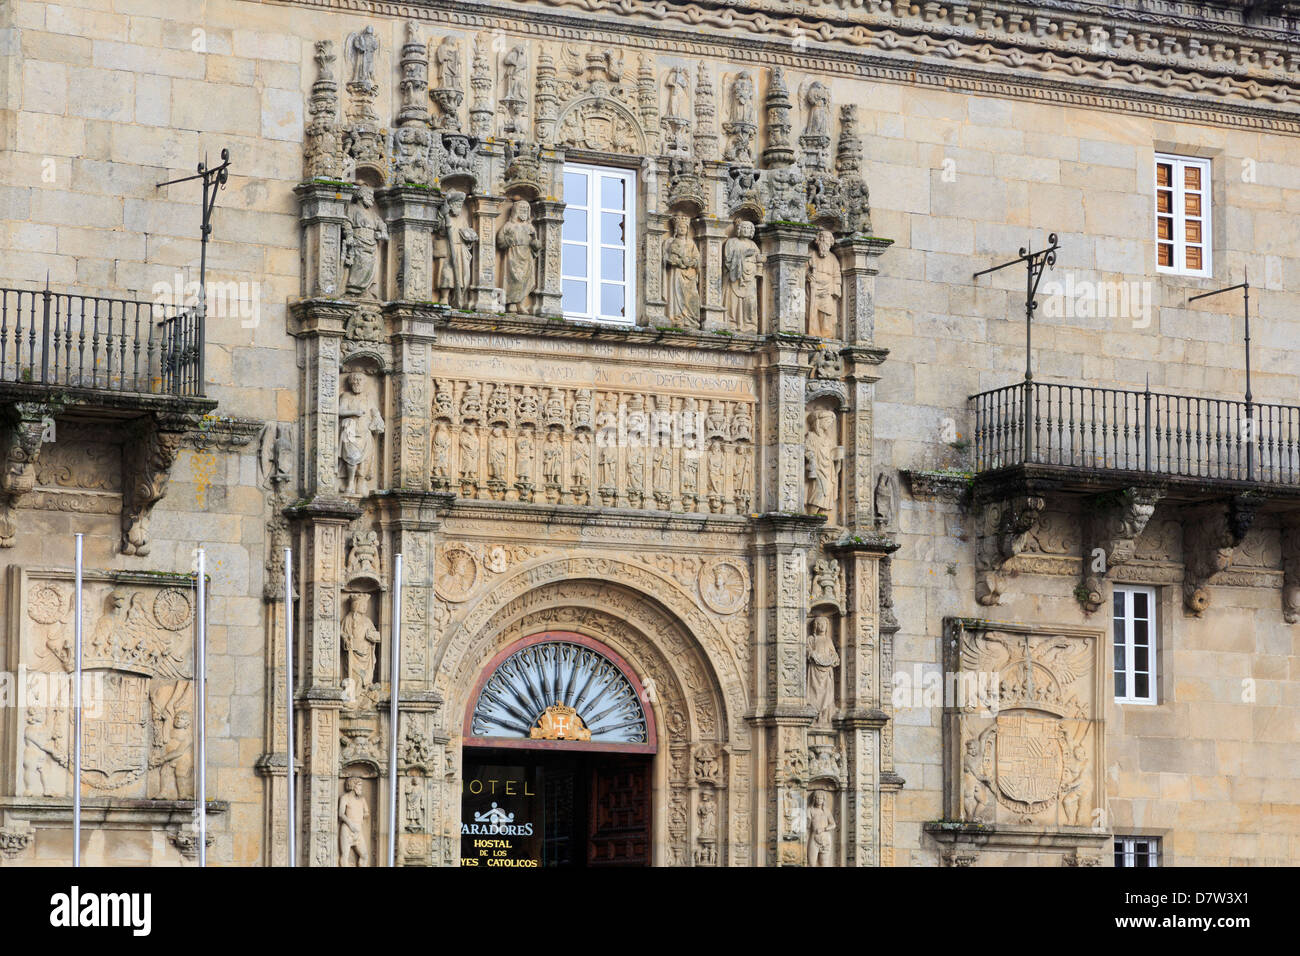 Hostal dos Reis Catolicos in Old Town, Santiago de Compostela, UNESCO World Heritage Site, Galicia, Spain - Stock Image